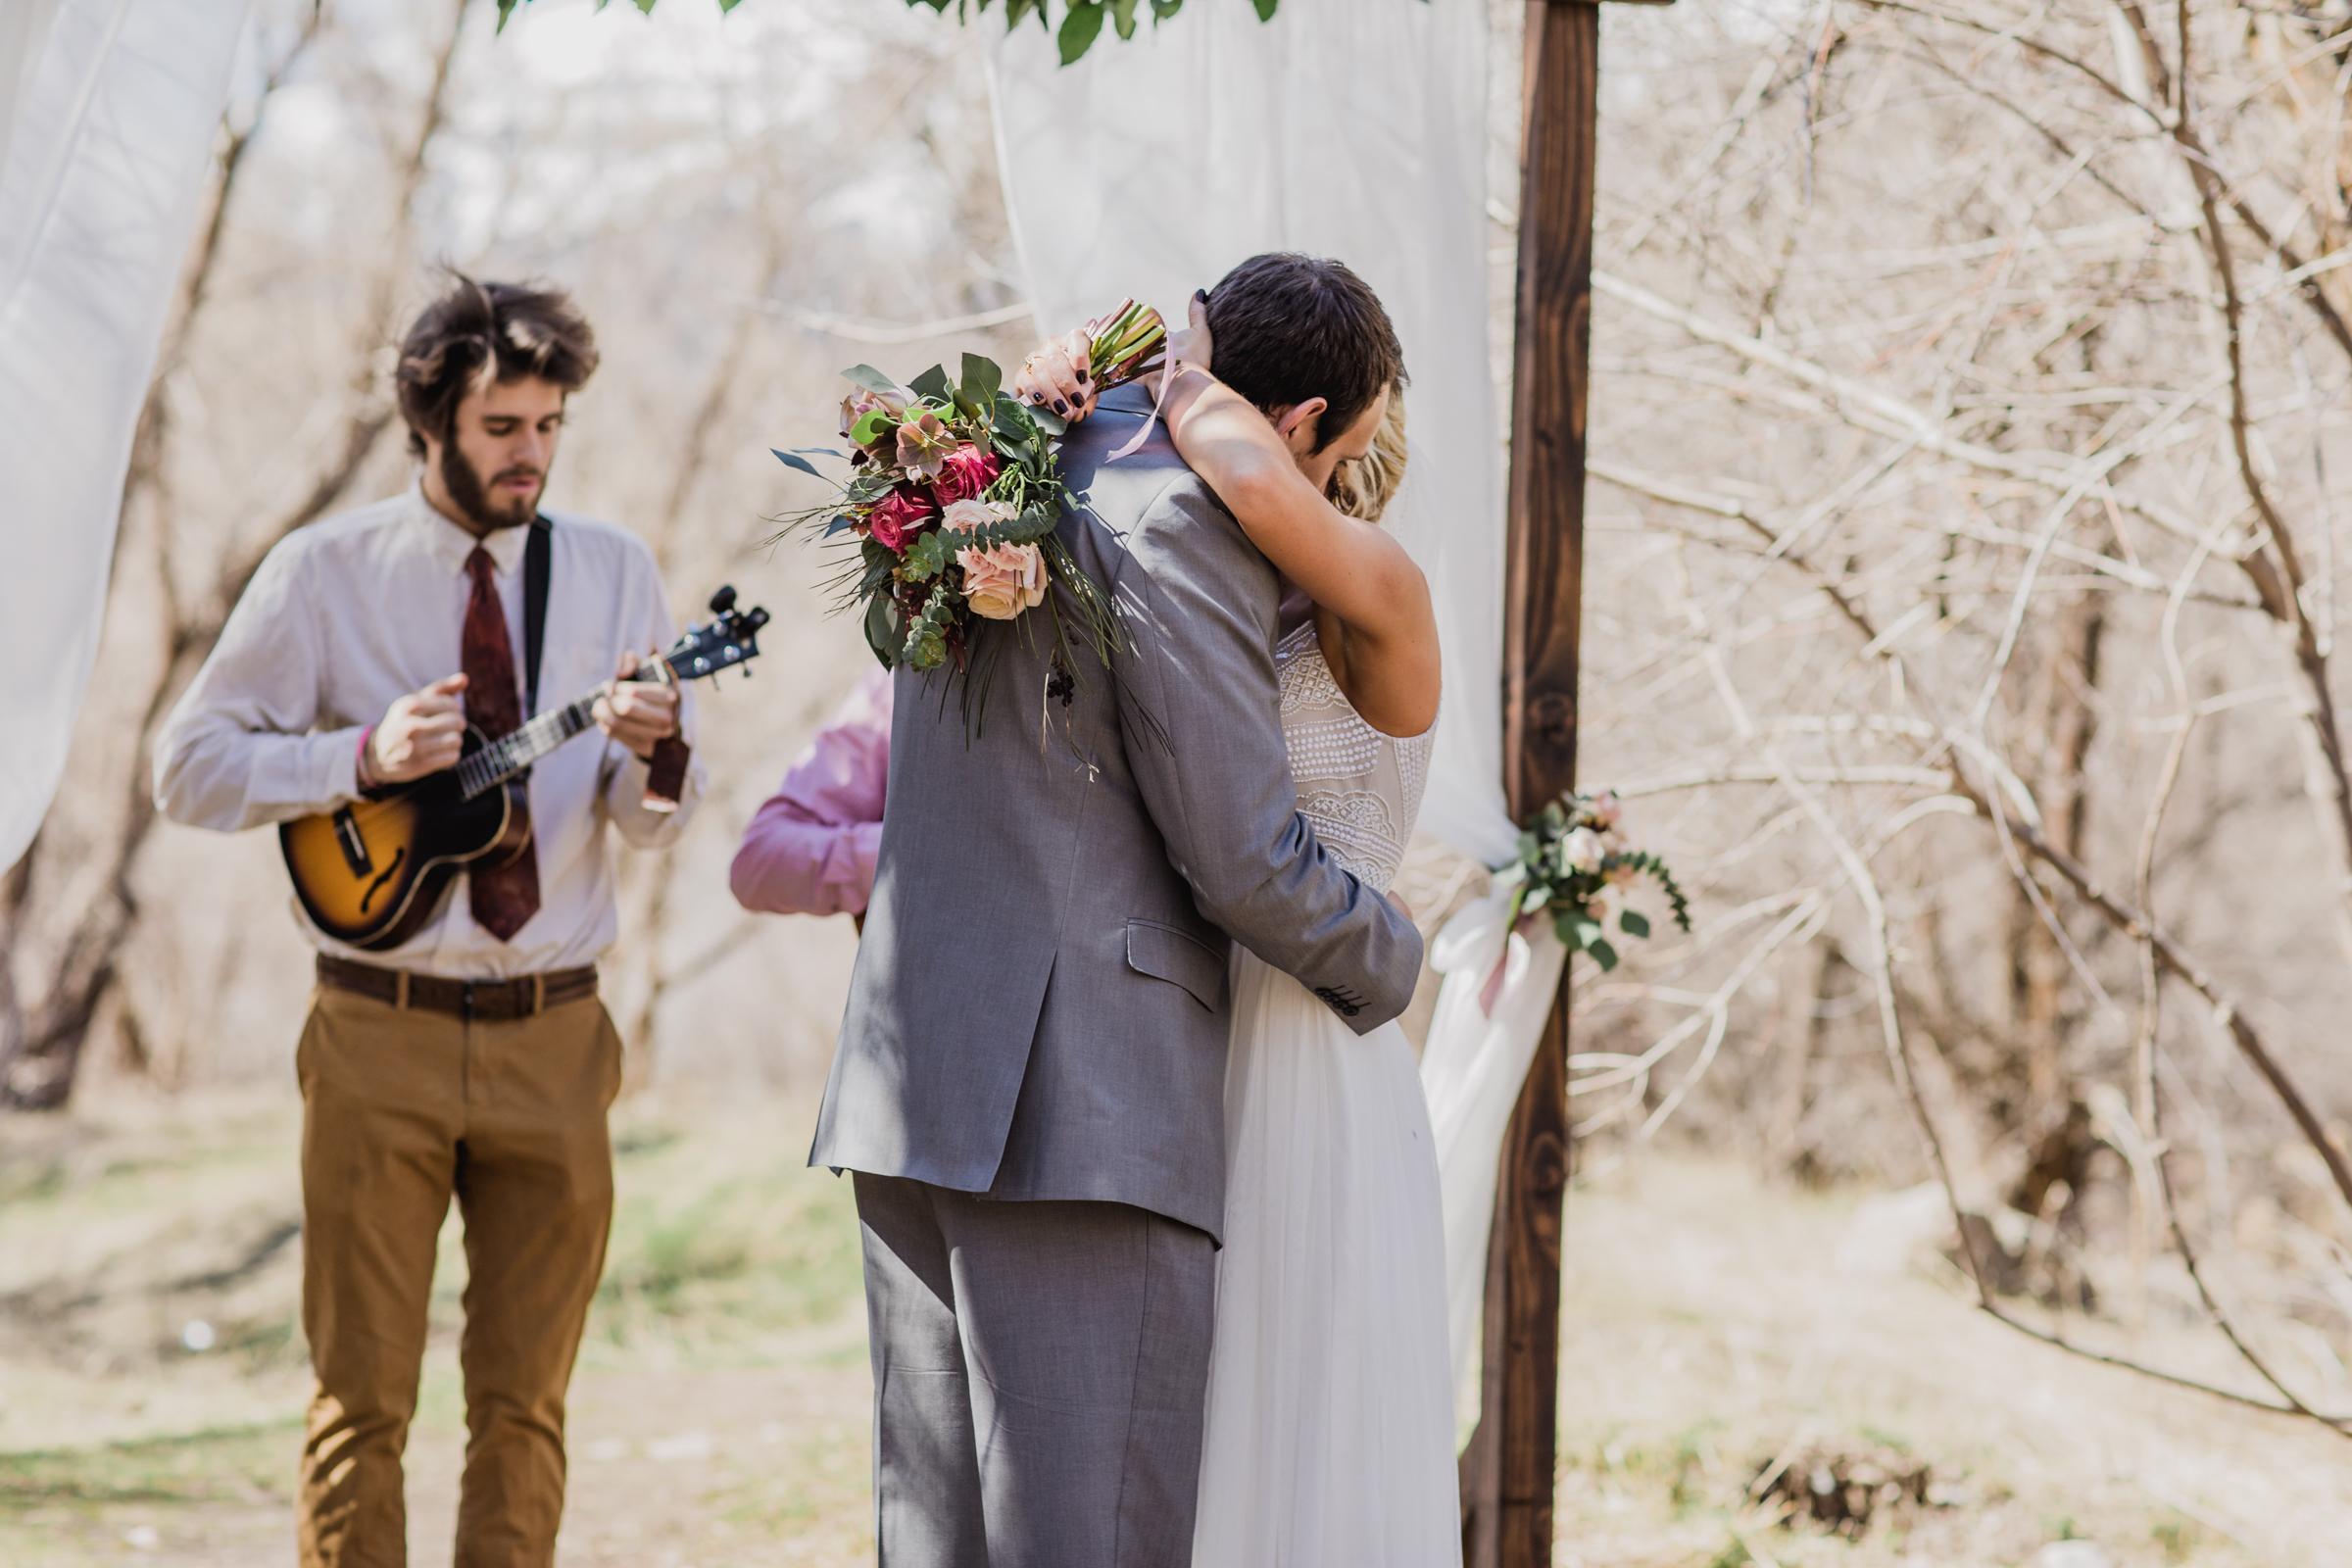 ryannwedding-143.jpg